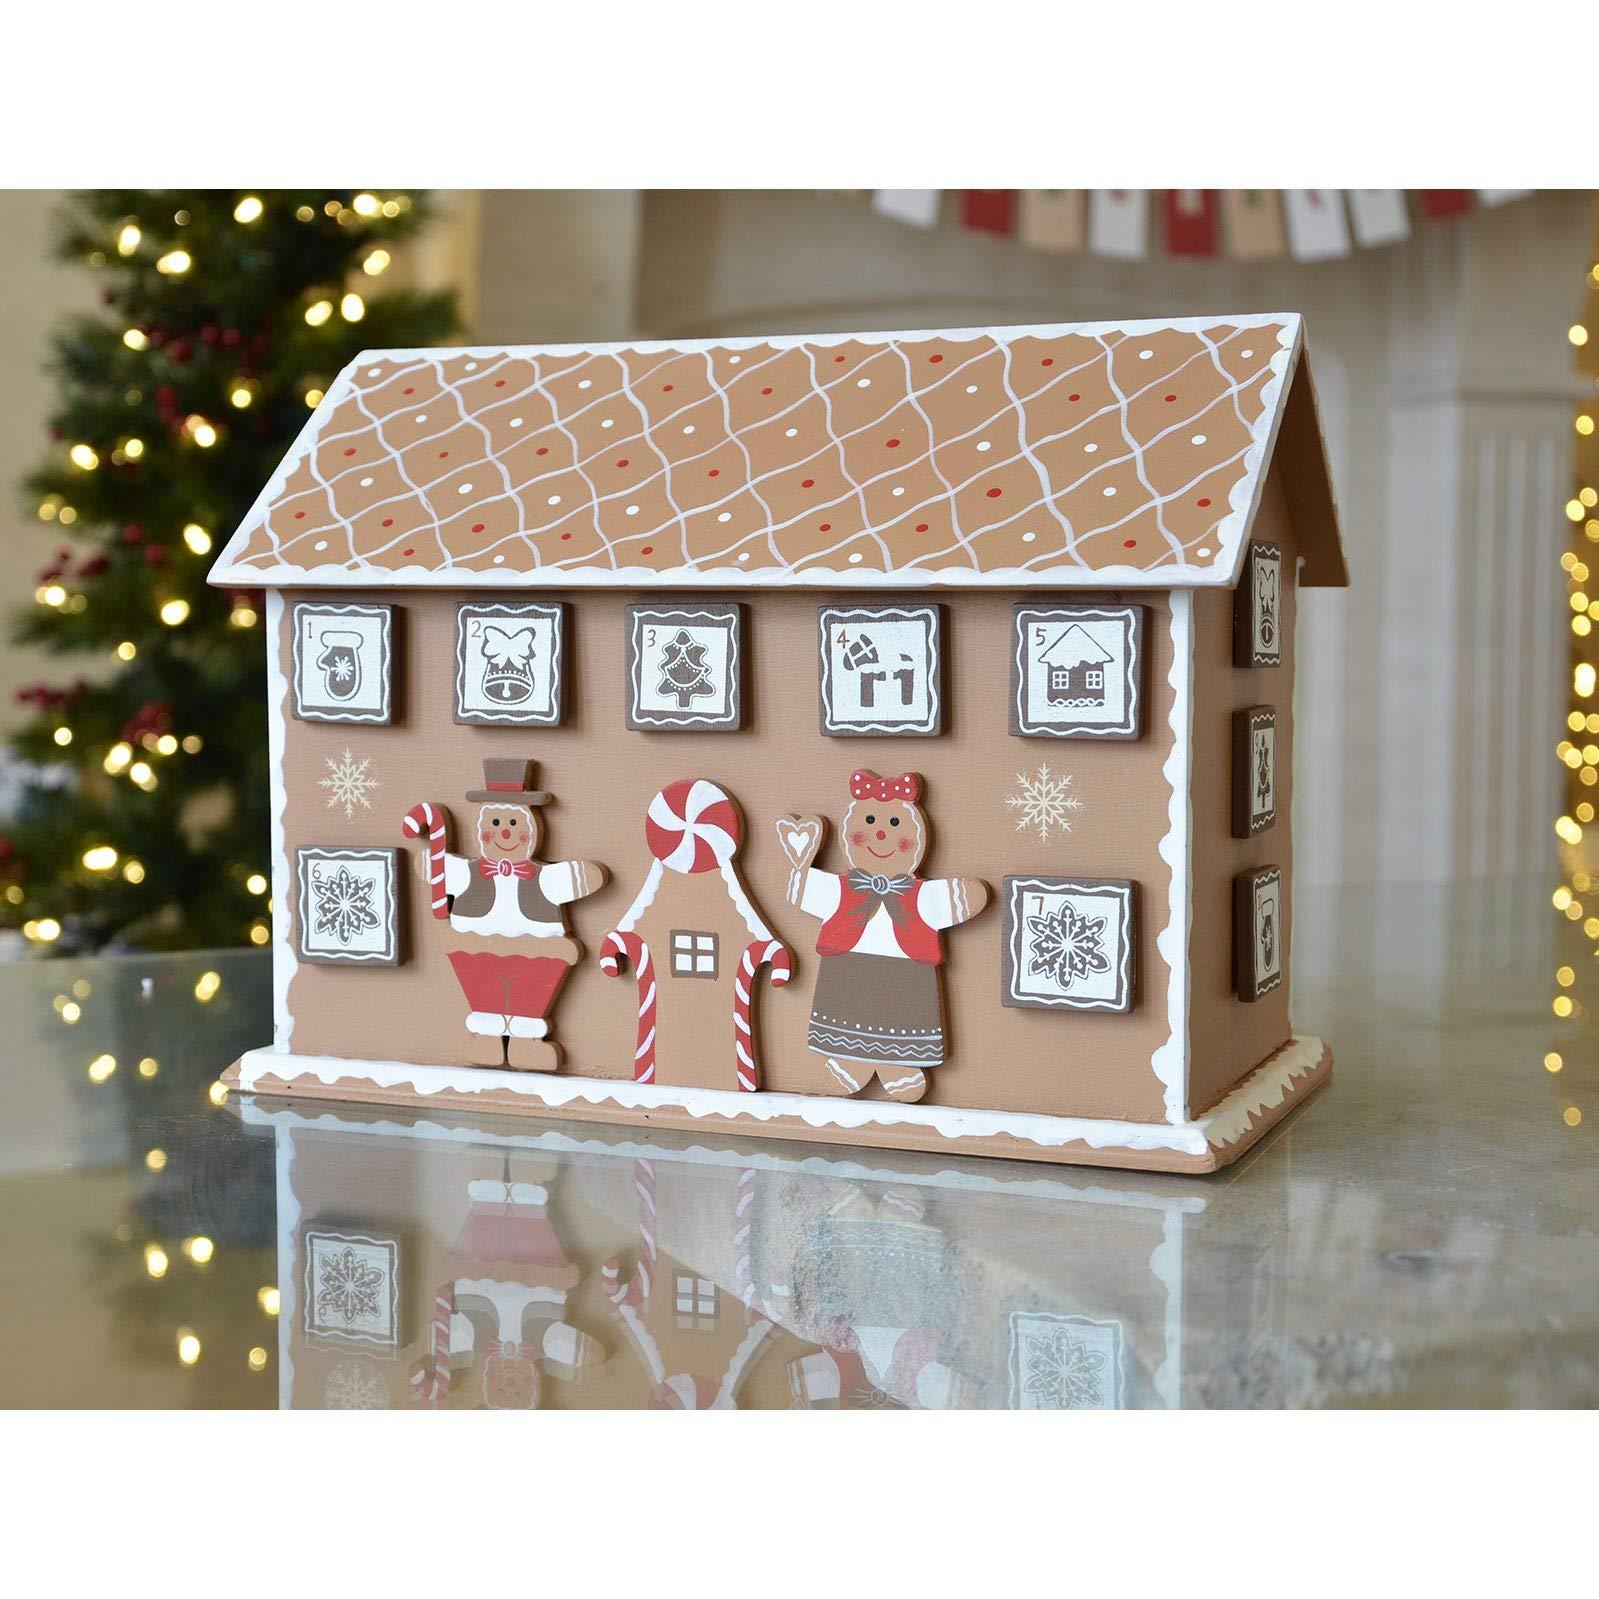 Wooden Gingerbread House Advent Calendar 32.5cm x 26cm